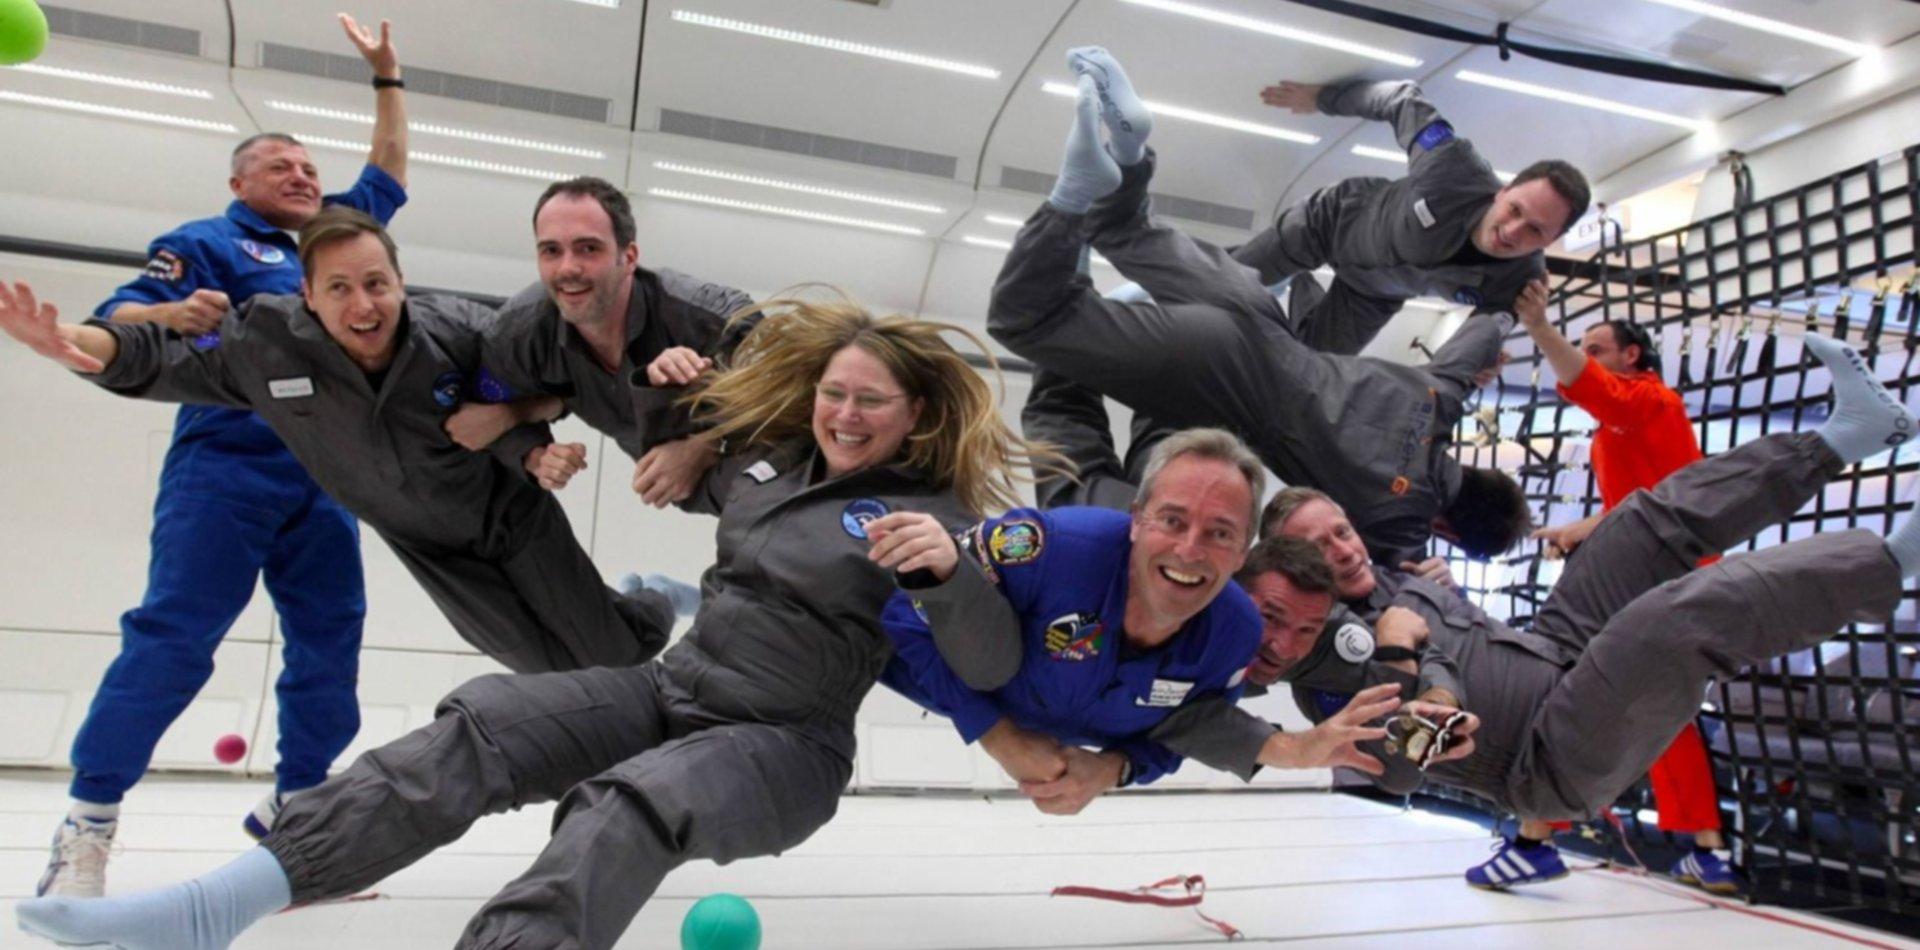 Convocan a un concurso que premiará a los ganadores con un día para ser astronautas